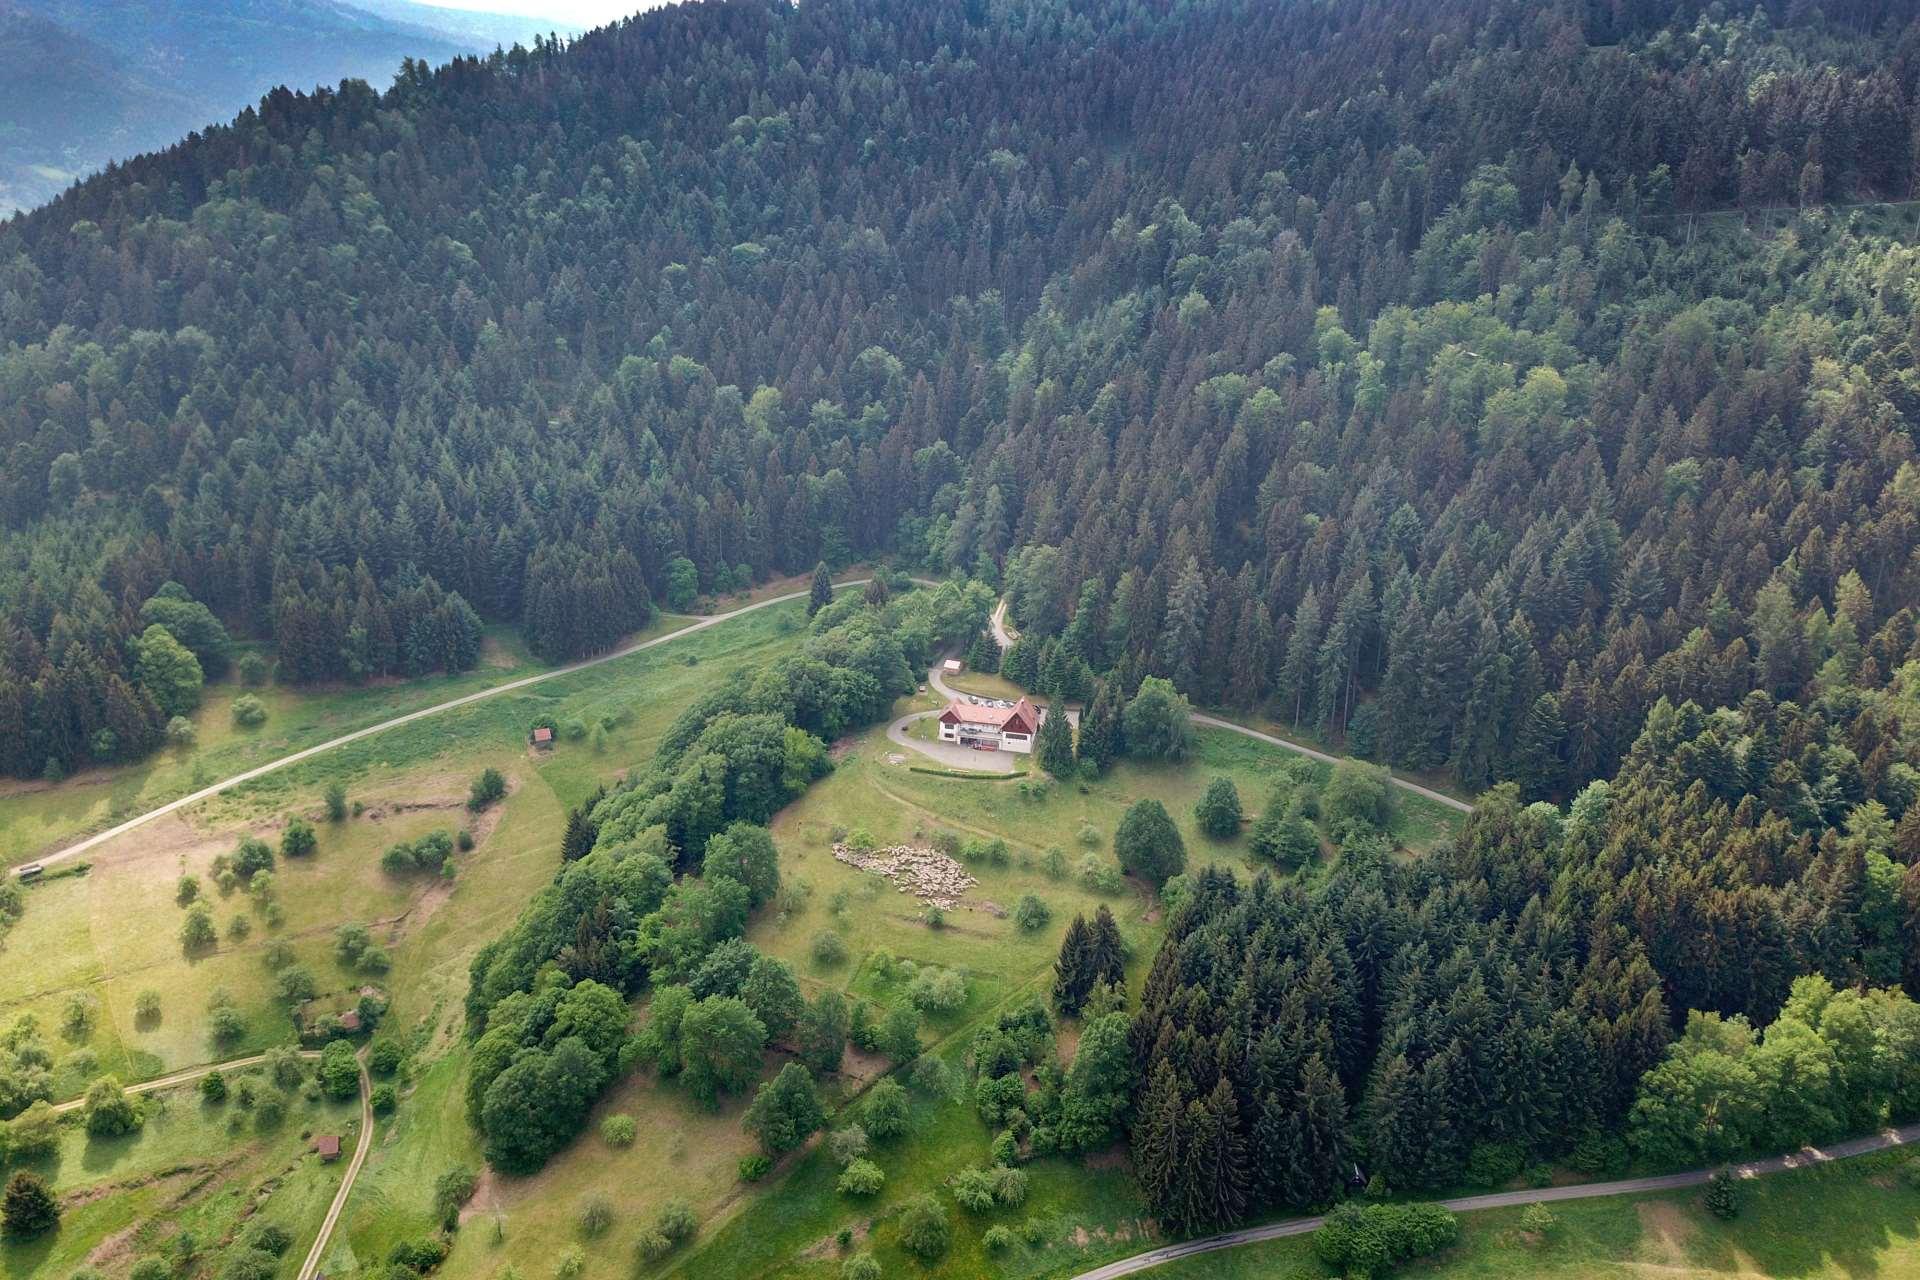 Umgebung des Kolpinghaus Weisenbach